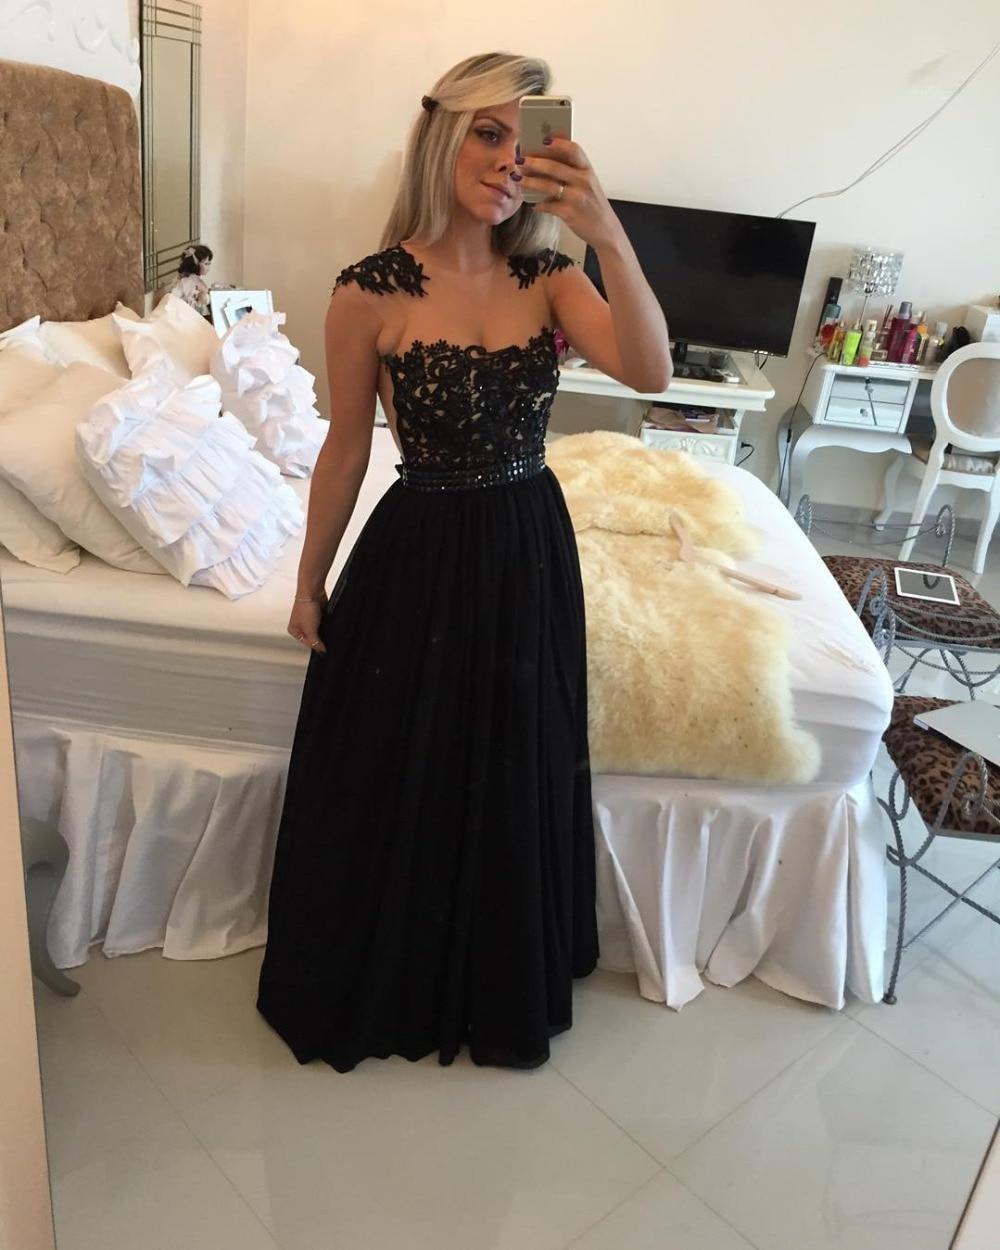 Chiffon A-Line Black Long   Prom     Dresses   2019 Jewel Neck Cap Sleeves Vestidos De Formatura Lace Applique On Tulle   Prom  /Party   Dress